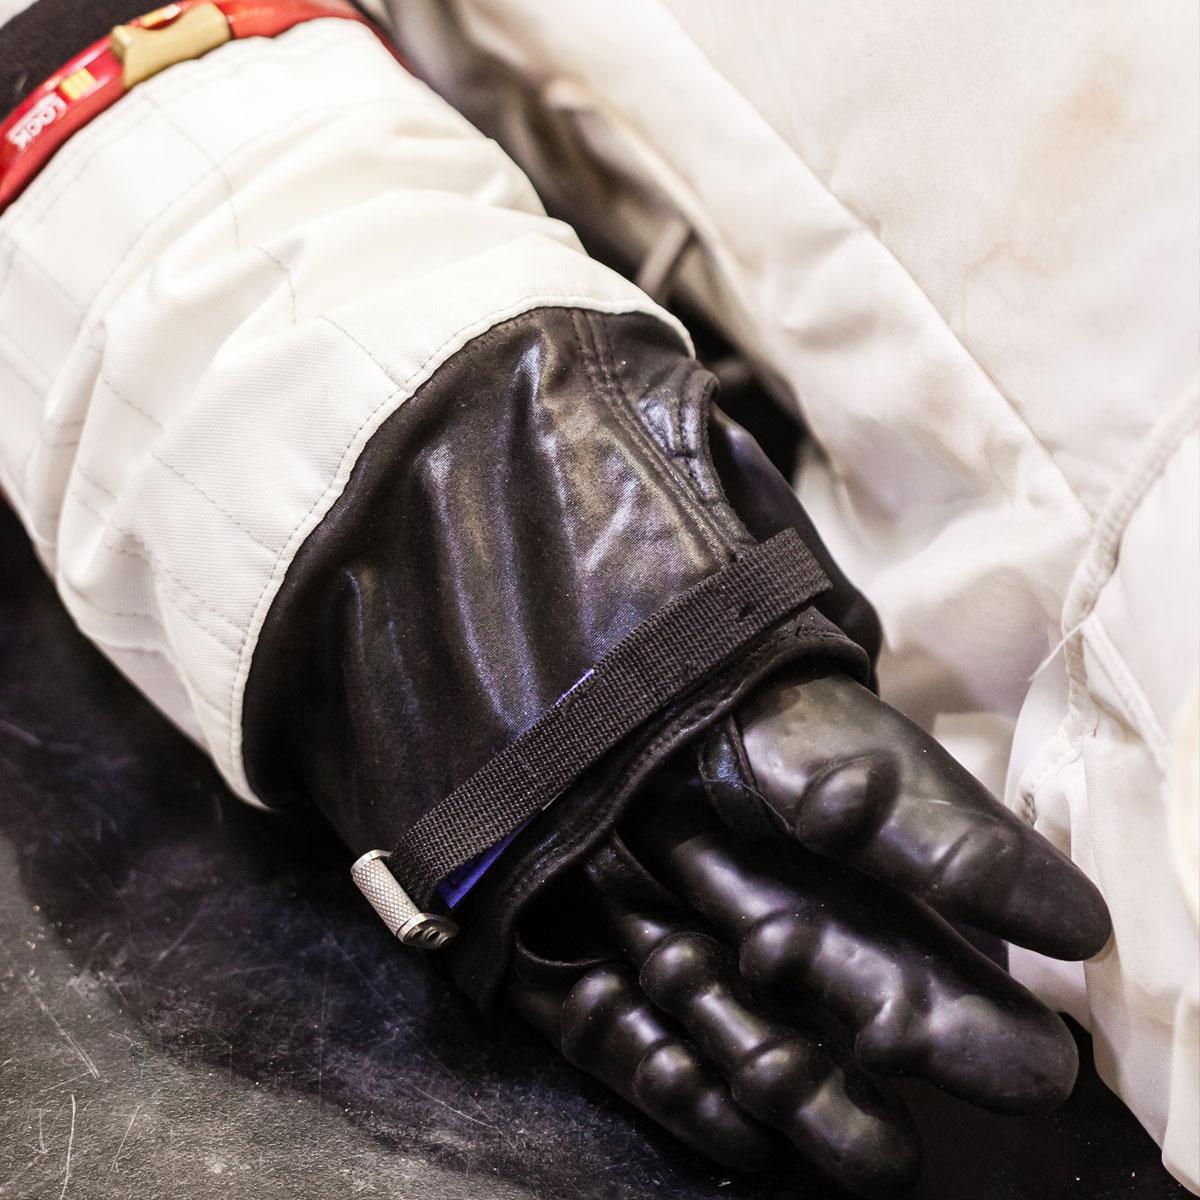 dc-suit-glove-sq.jpg